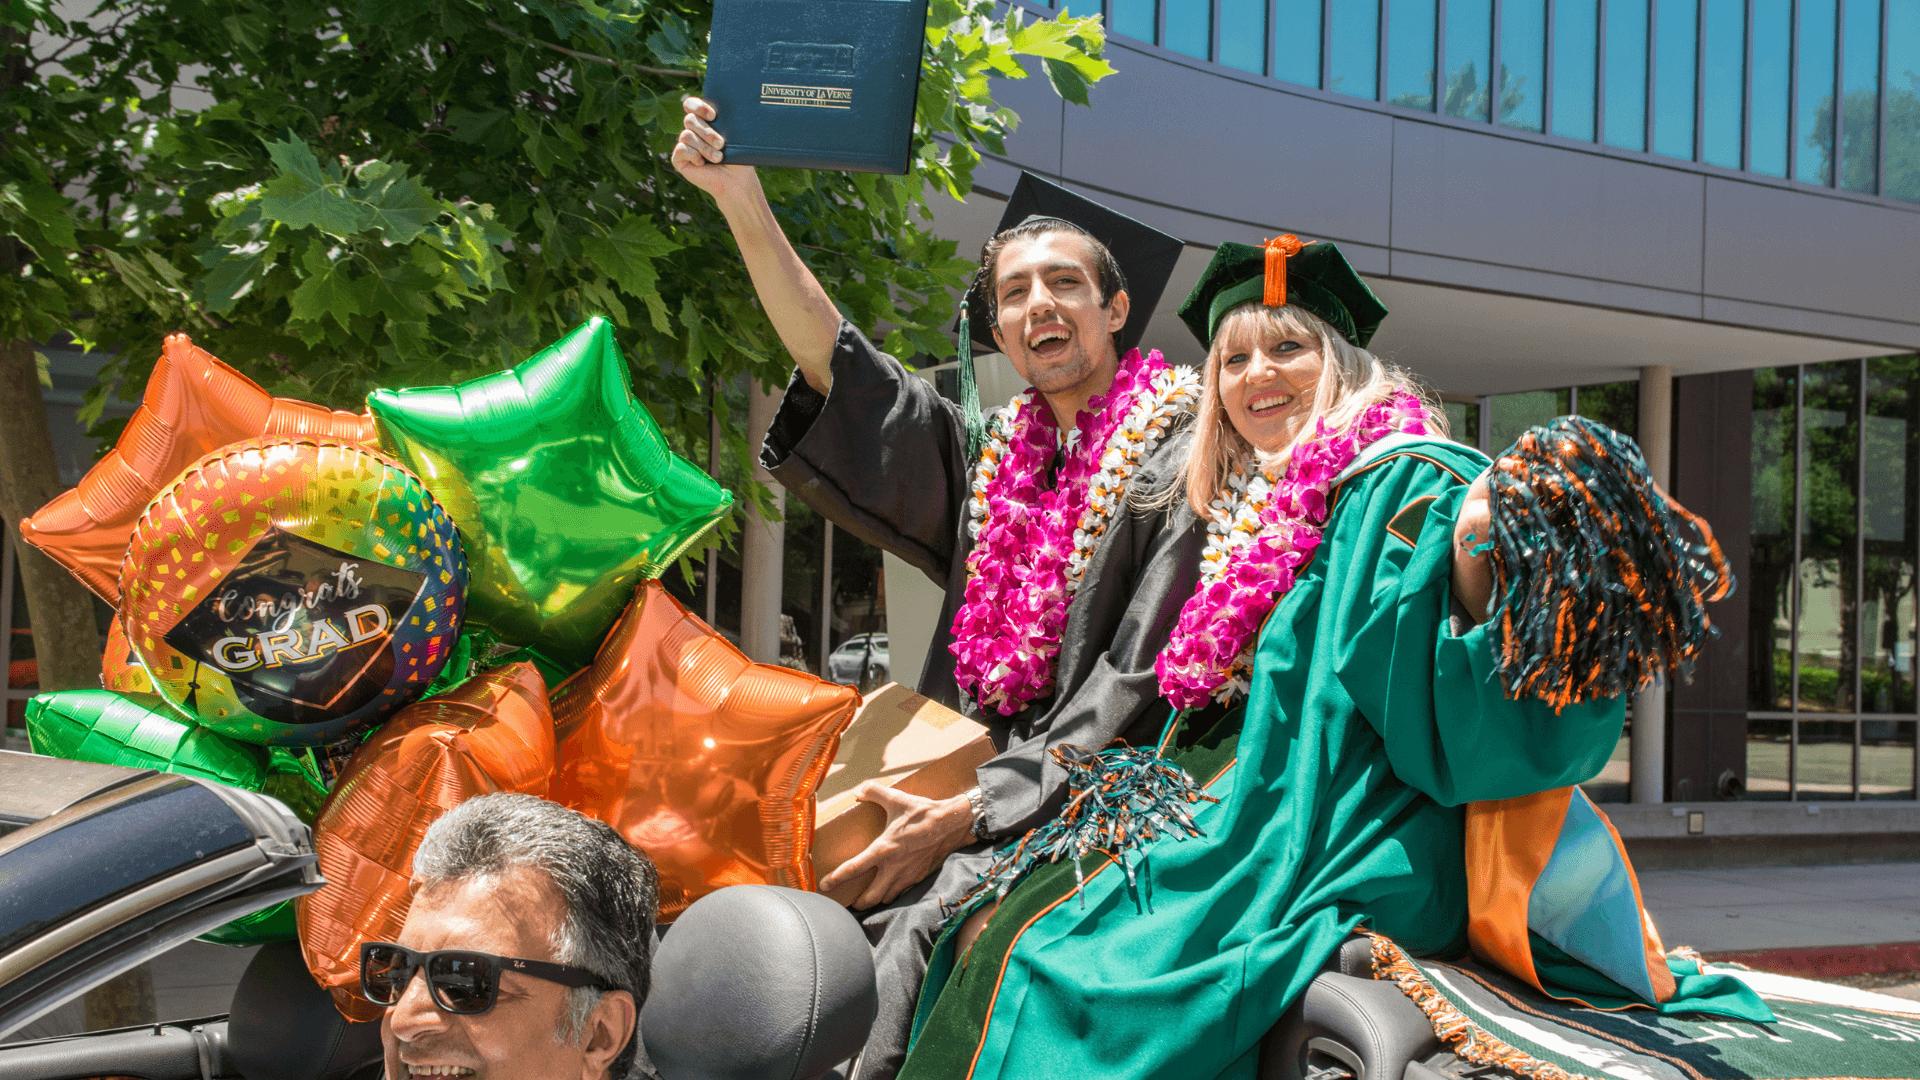 Grad Gift Box Parade Lead Image